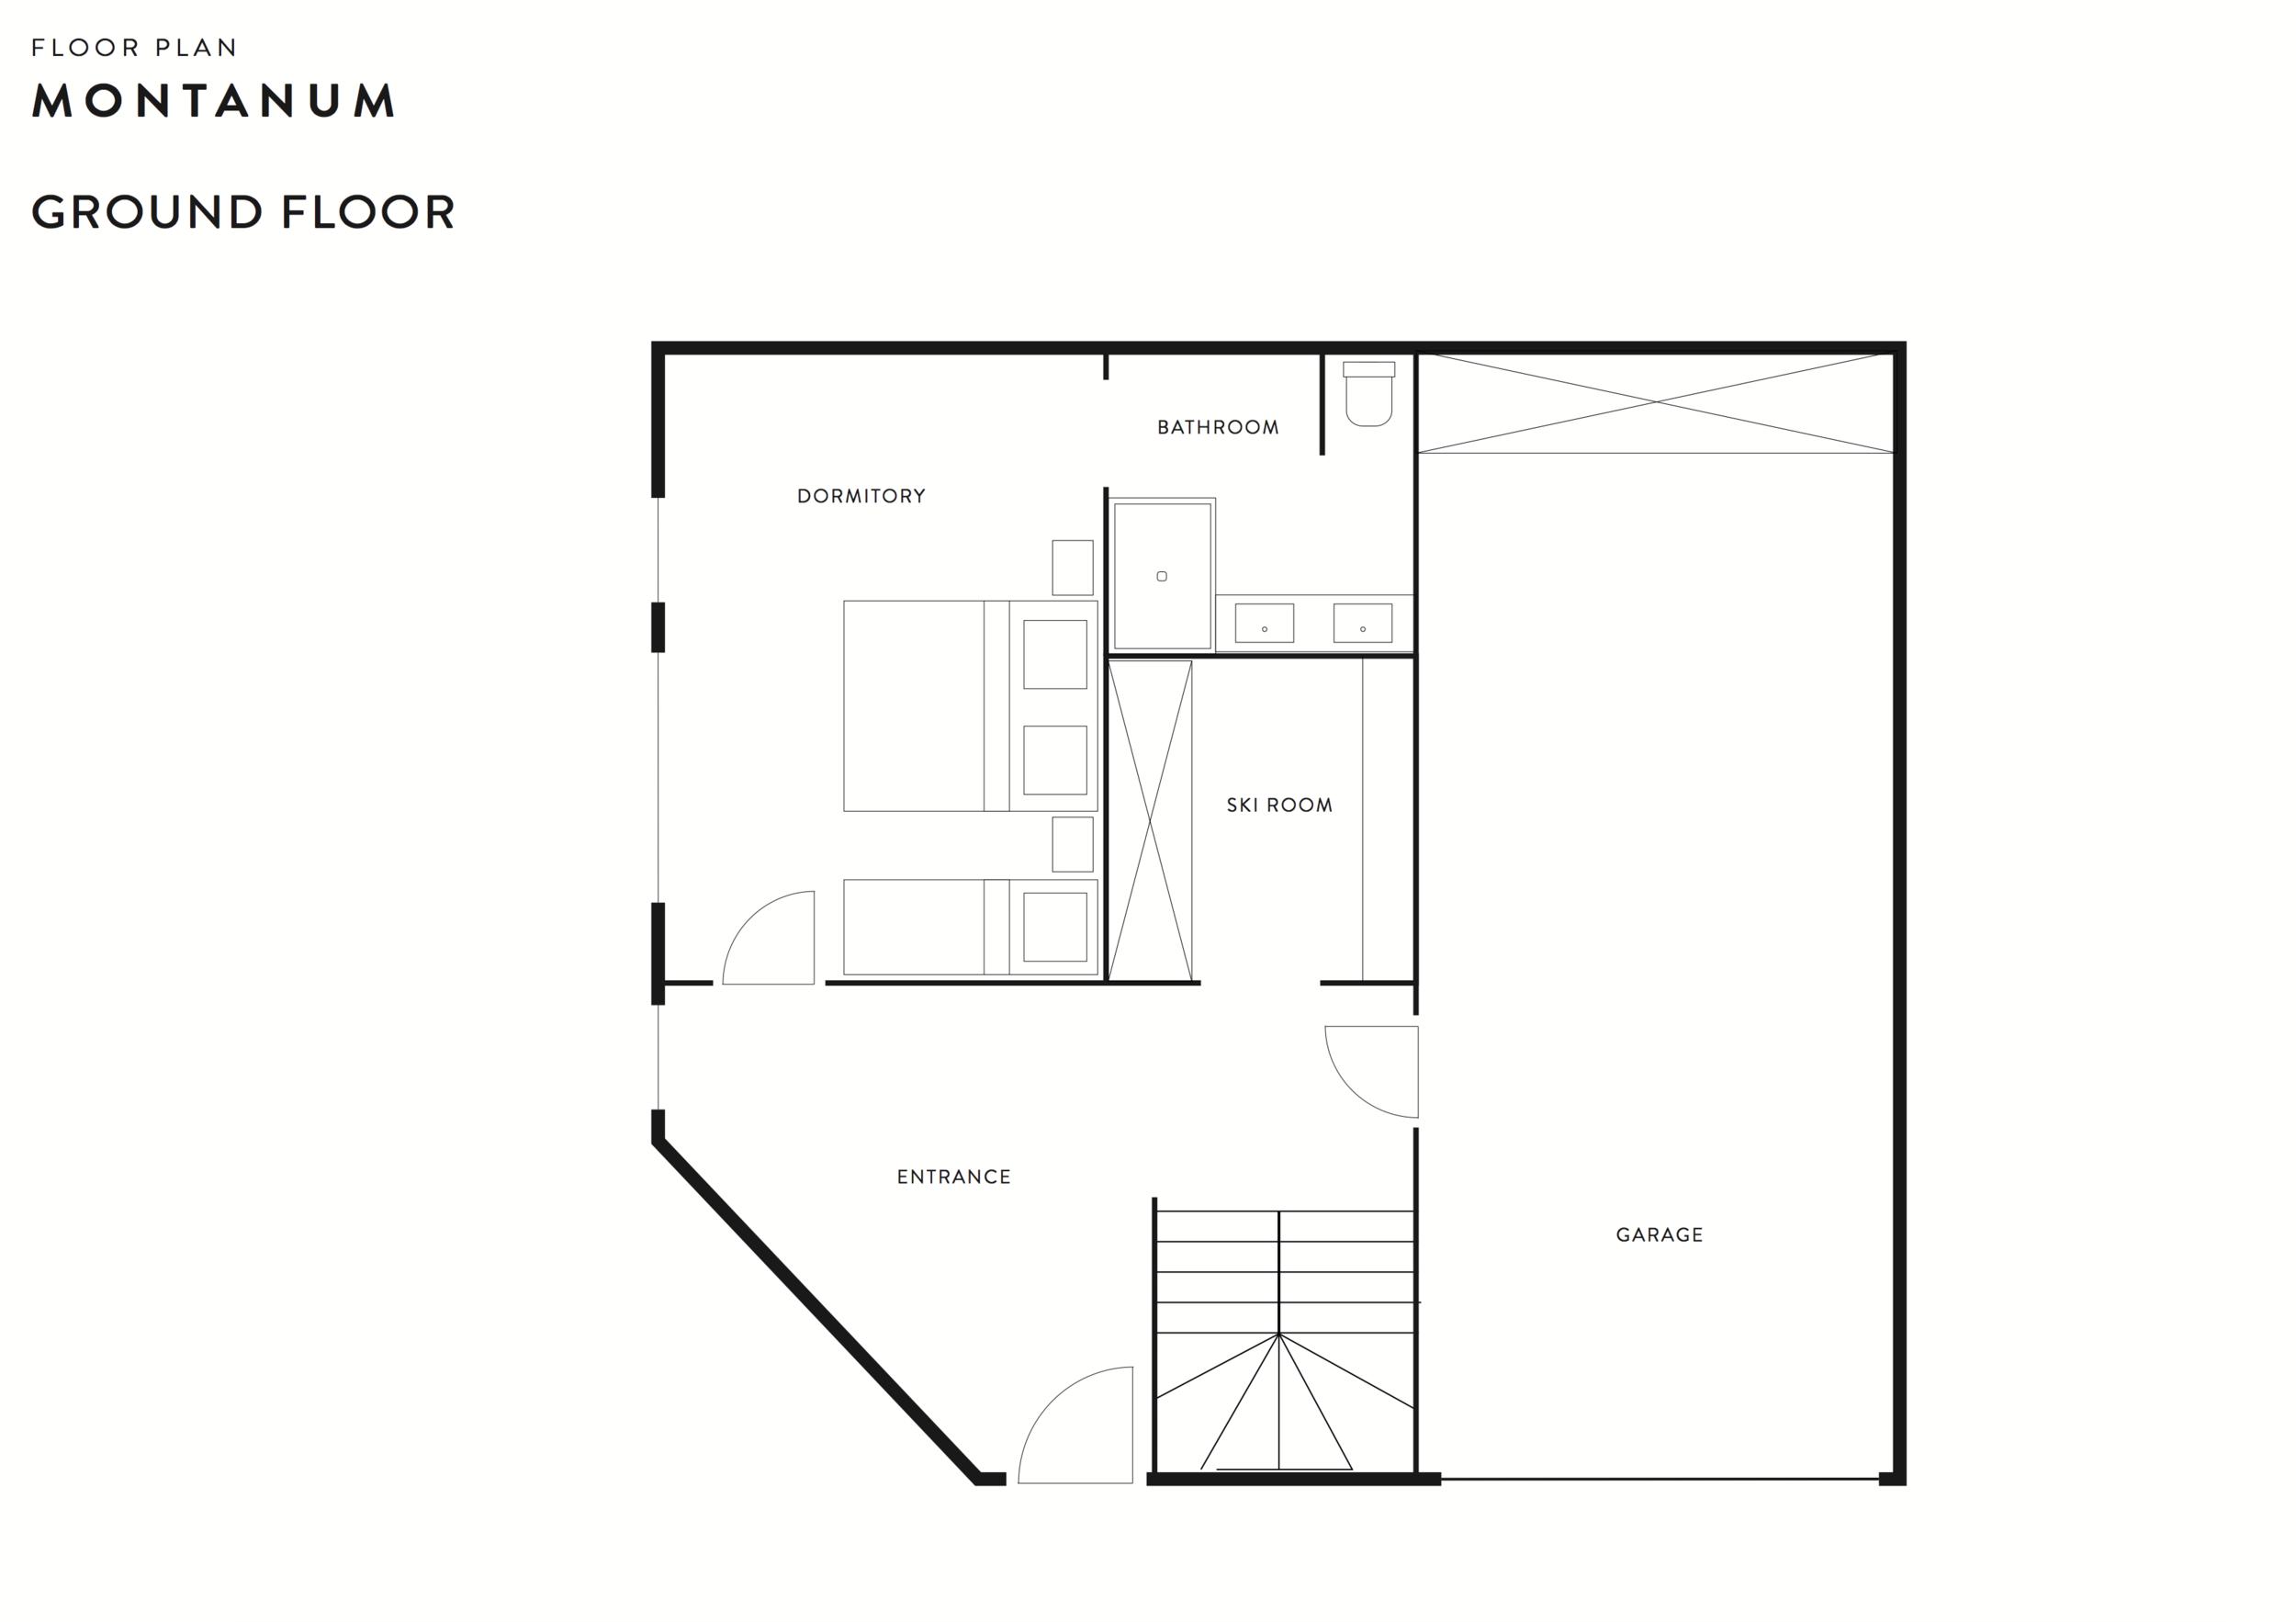 montanum-floor-plan-bumper-real-estate-france-courchevel-2.png